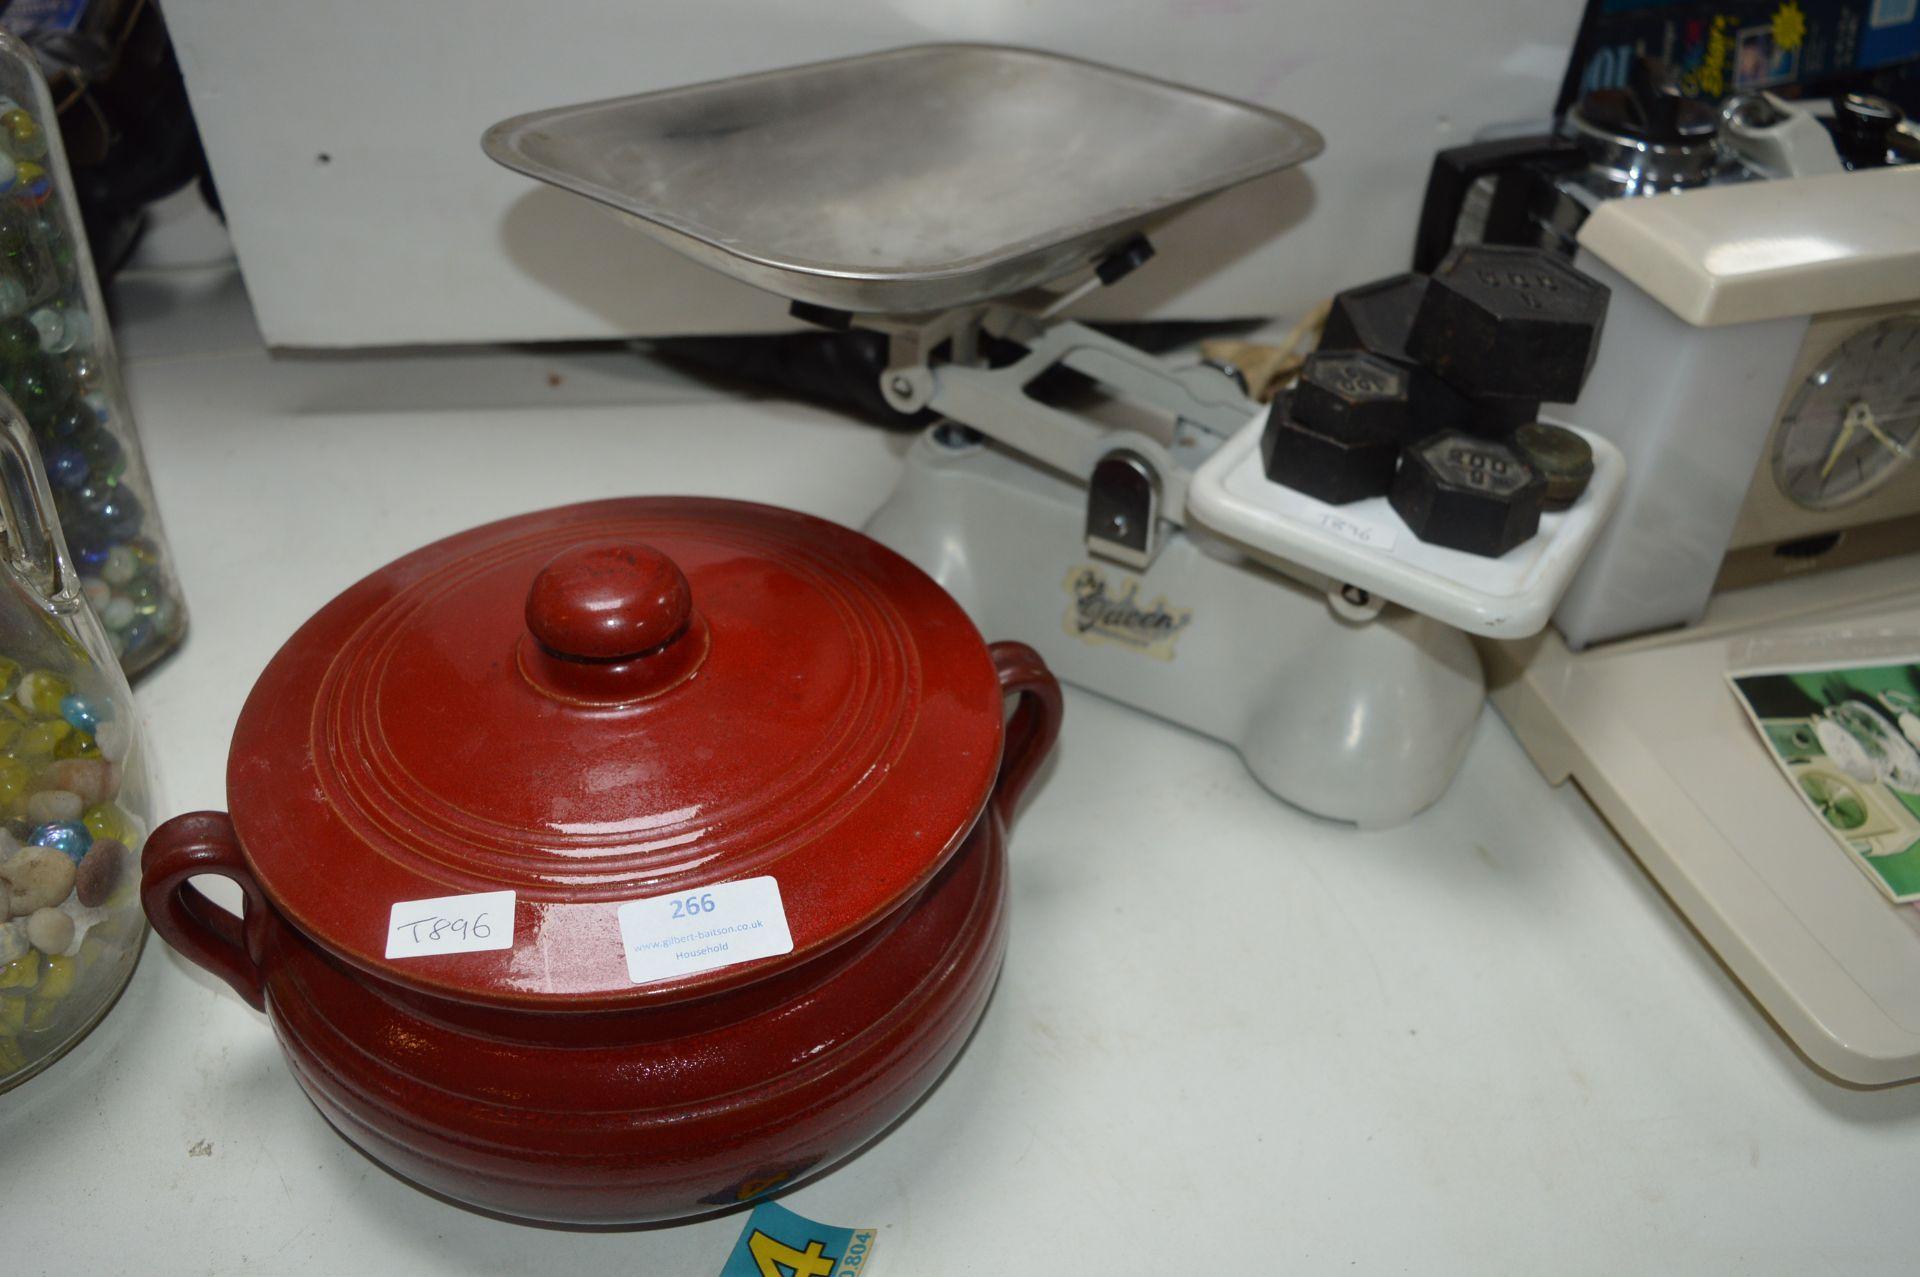 Vintage Kitchen Scales with Weights plus Casserole